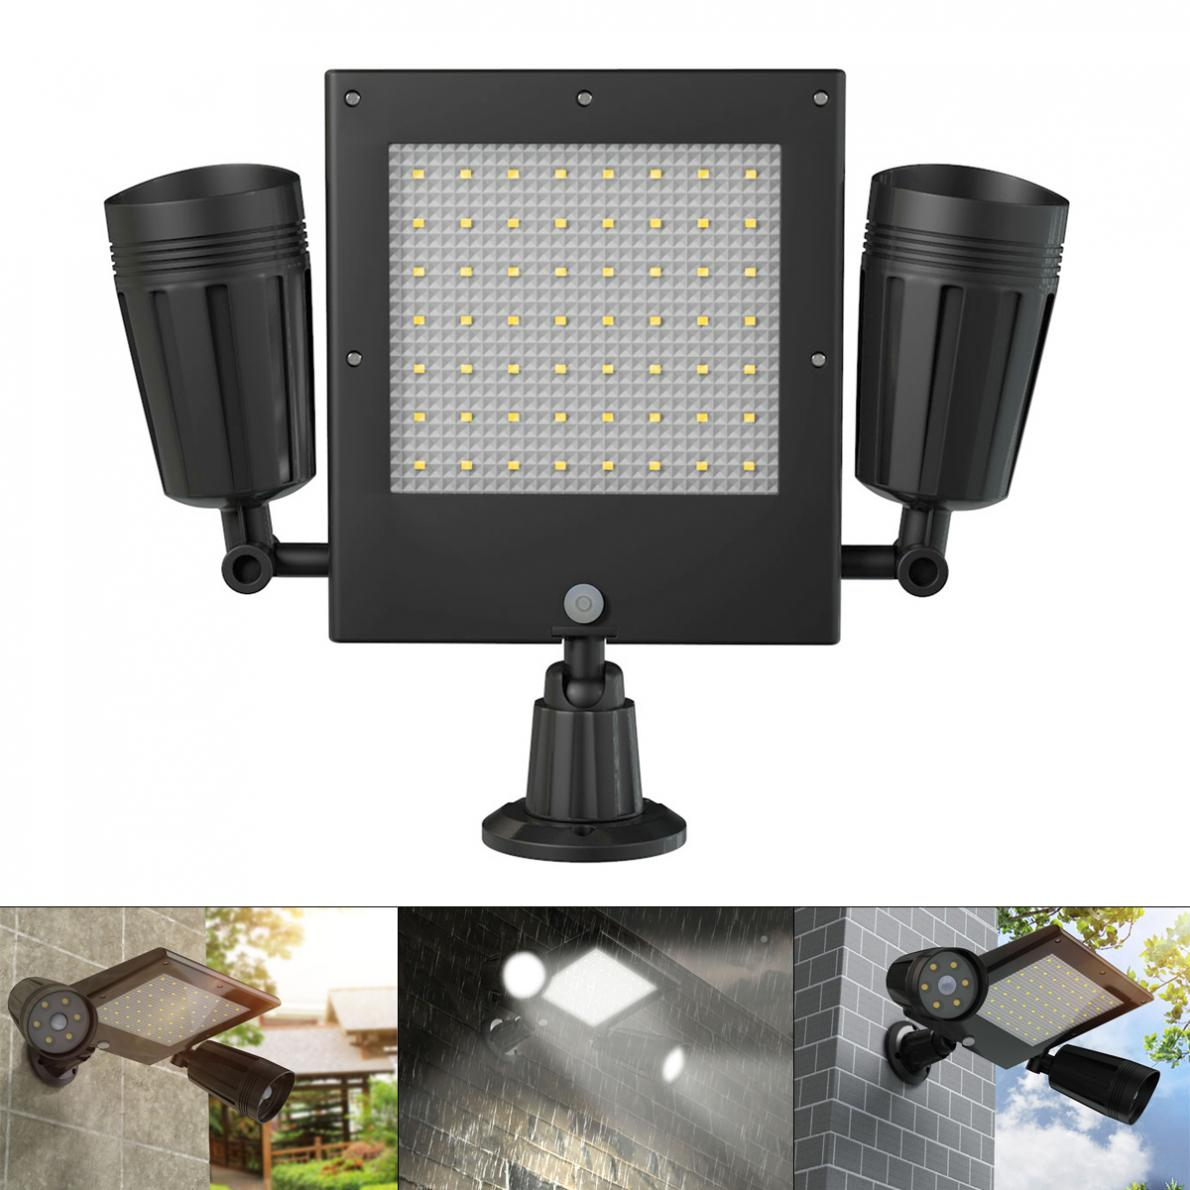 18650 3.7V 2000mAh 600LM Solar Double Spotlight 360 Degree Rotating PIR Motion Sensor Wall Light with for Outdoors / Courtyard